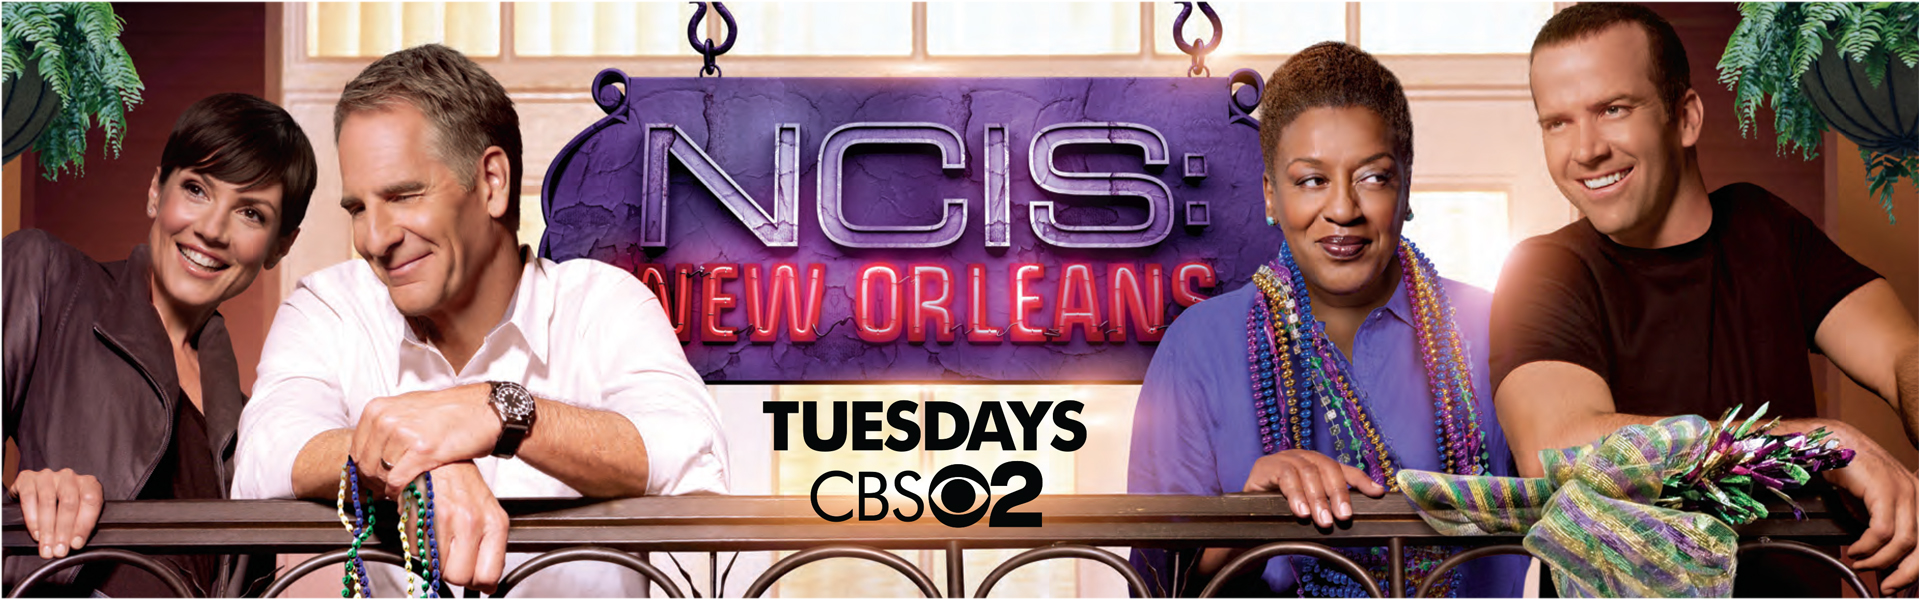 NCIS_NewOr_Billboard*.jpg